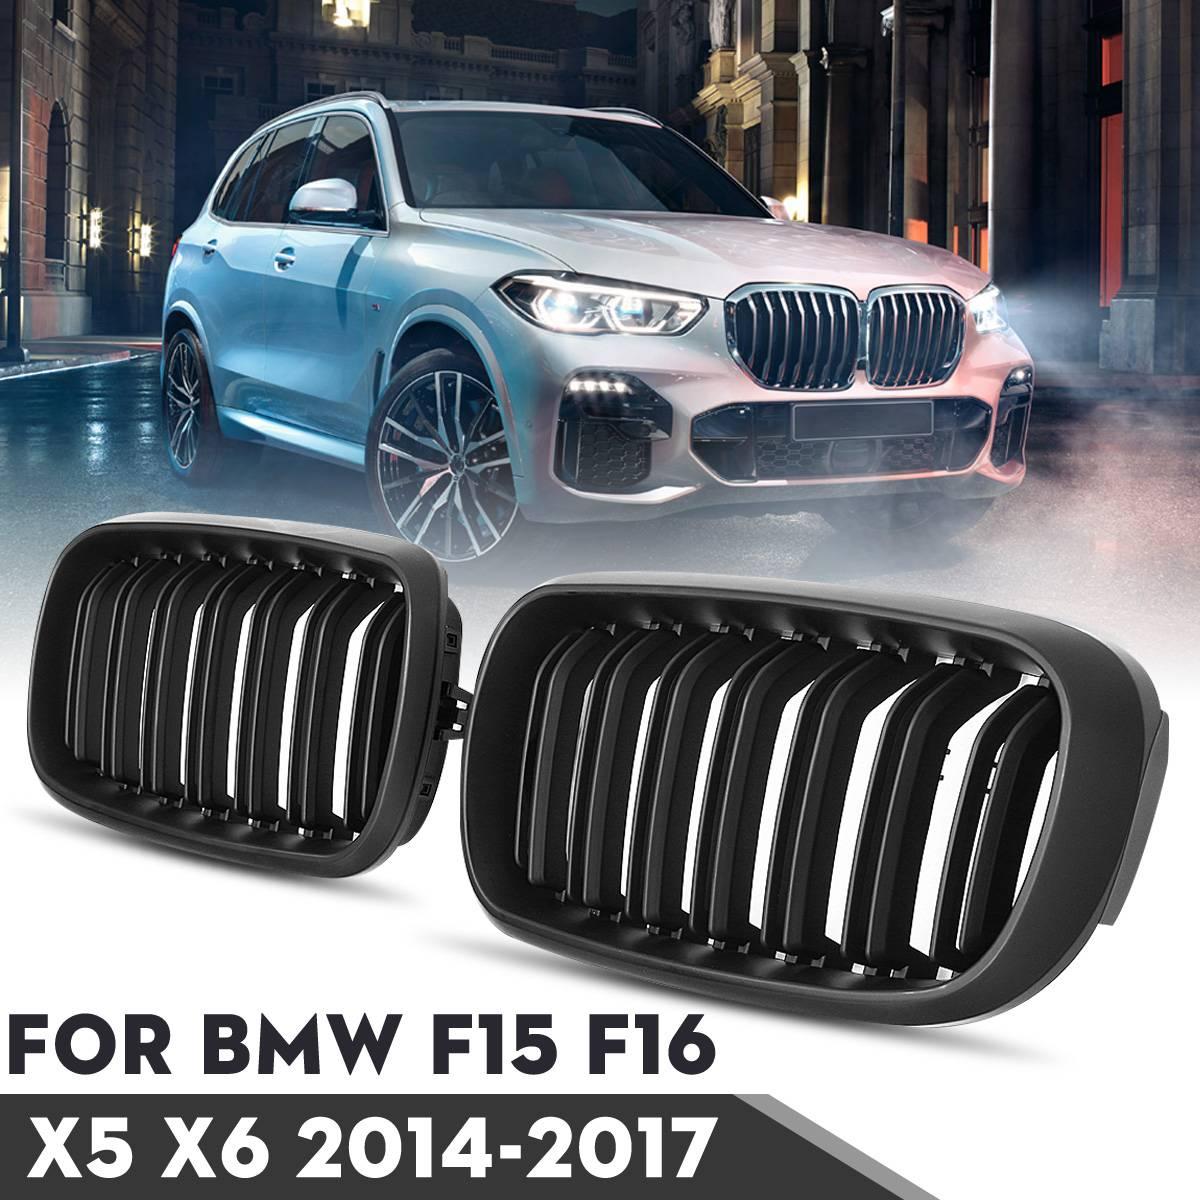 1 par parachoques delantero negro brillante/mate doble rejilla de 2 listones para BMW F15 F16 X5 X6 F85 F86 X5M X6M 2014-2017 rejillas